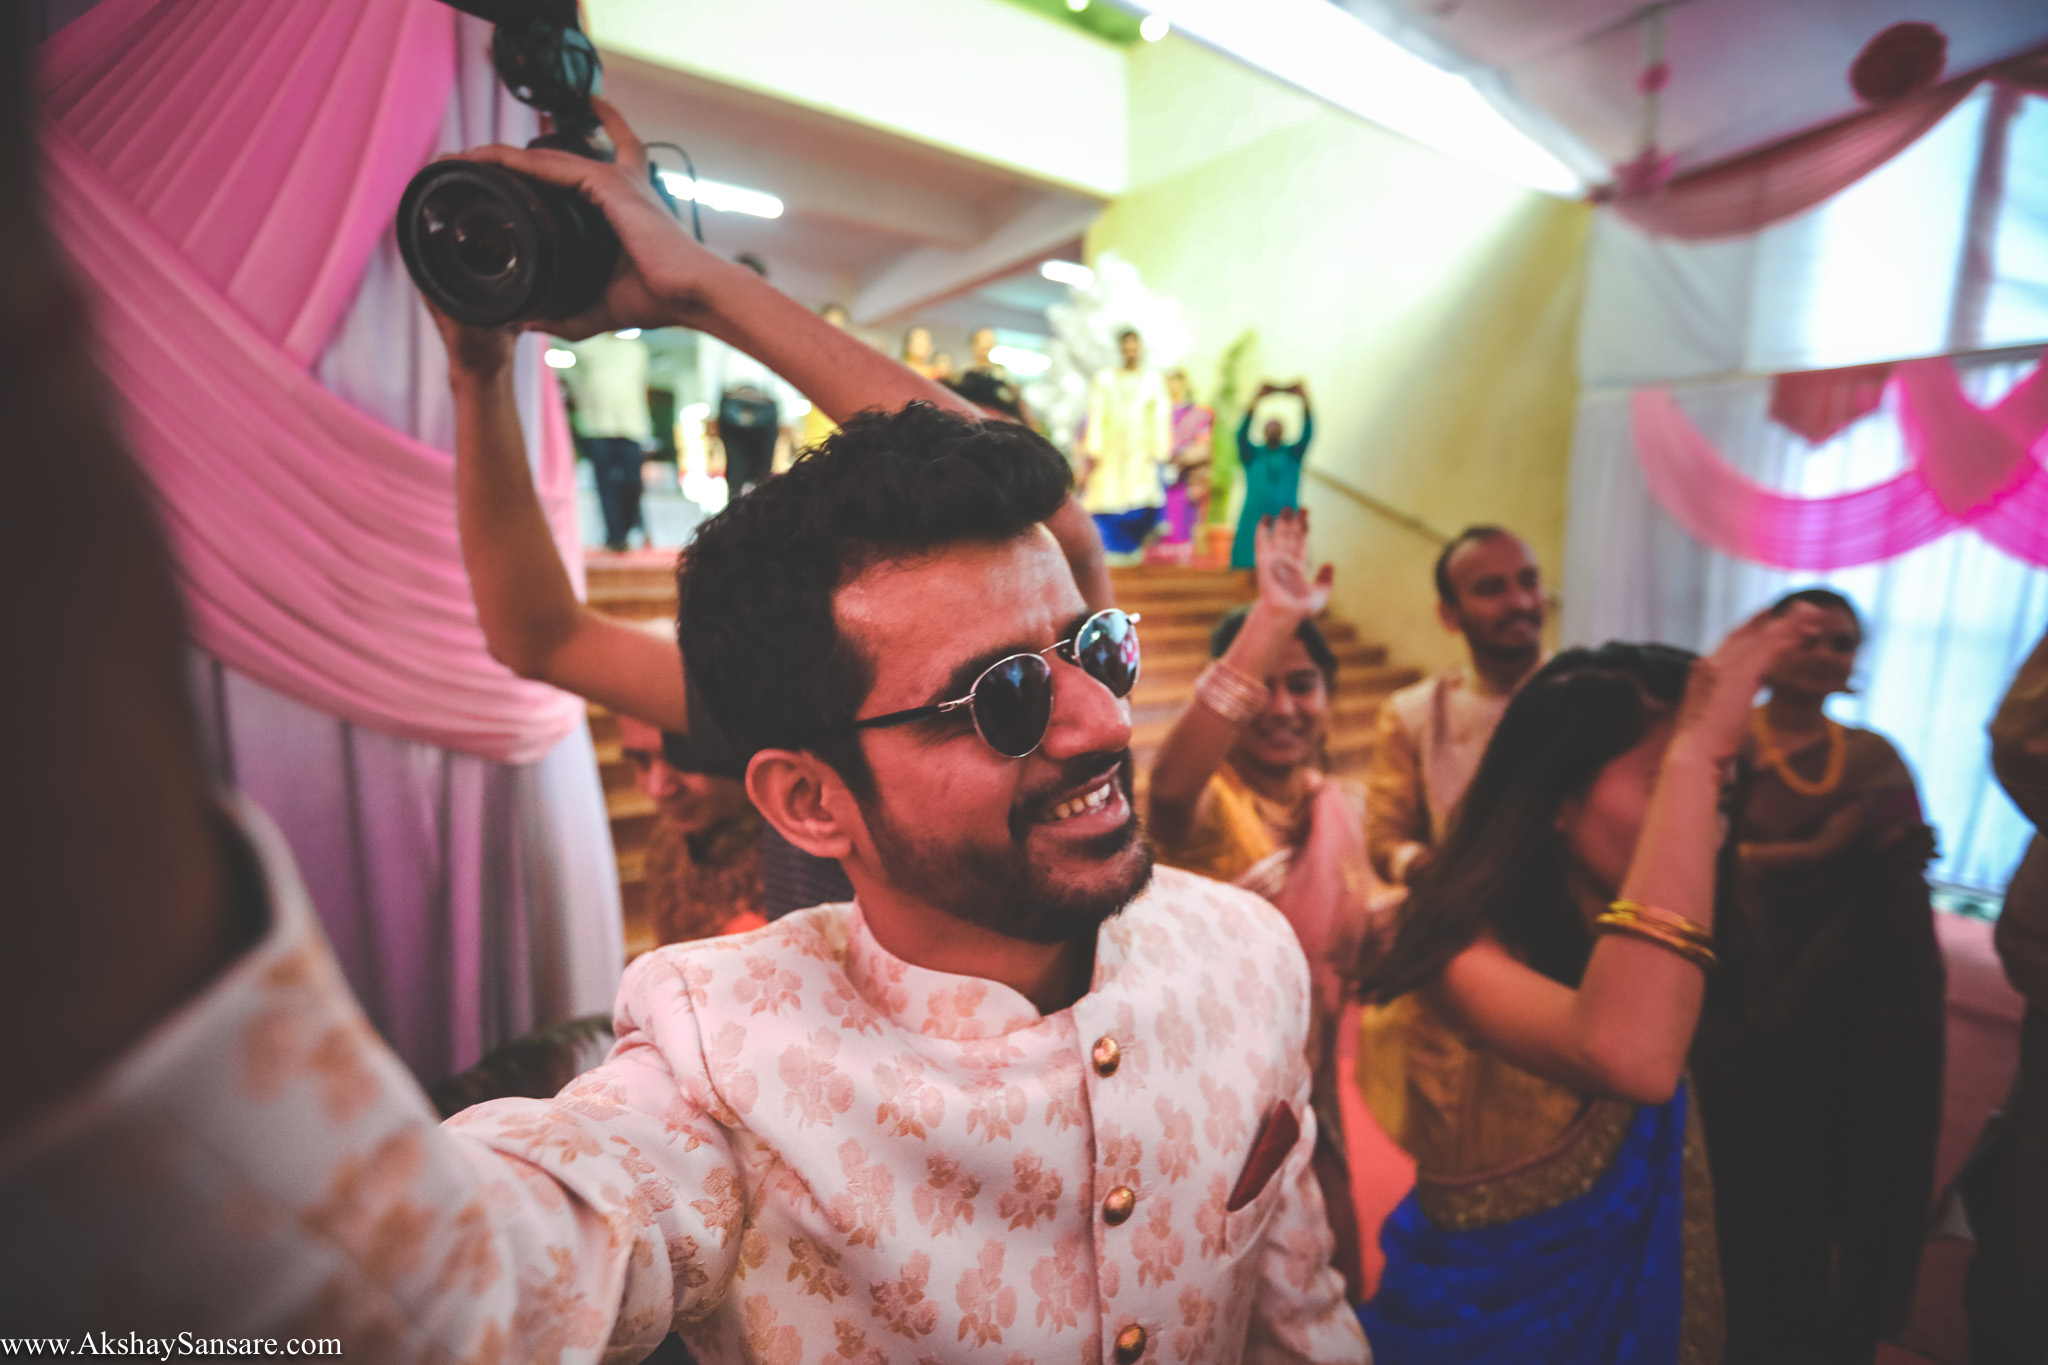 Akshay Sansare Photography Kunal x Shrutika best candid photographers in mumbai(30).jpg